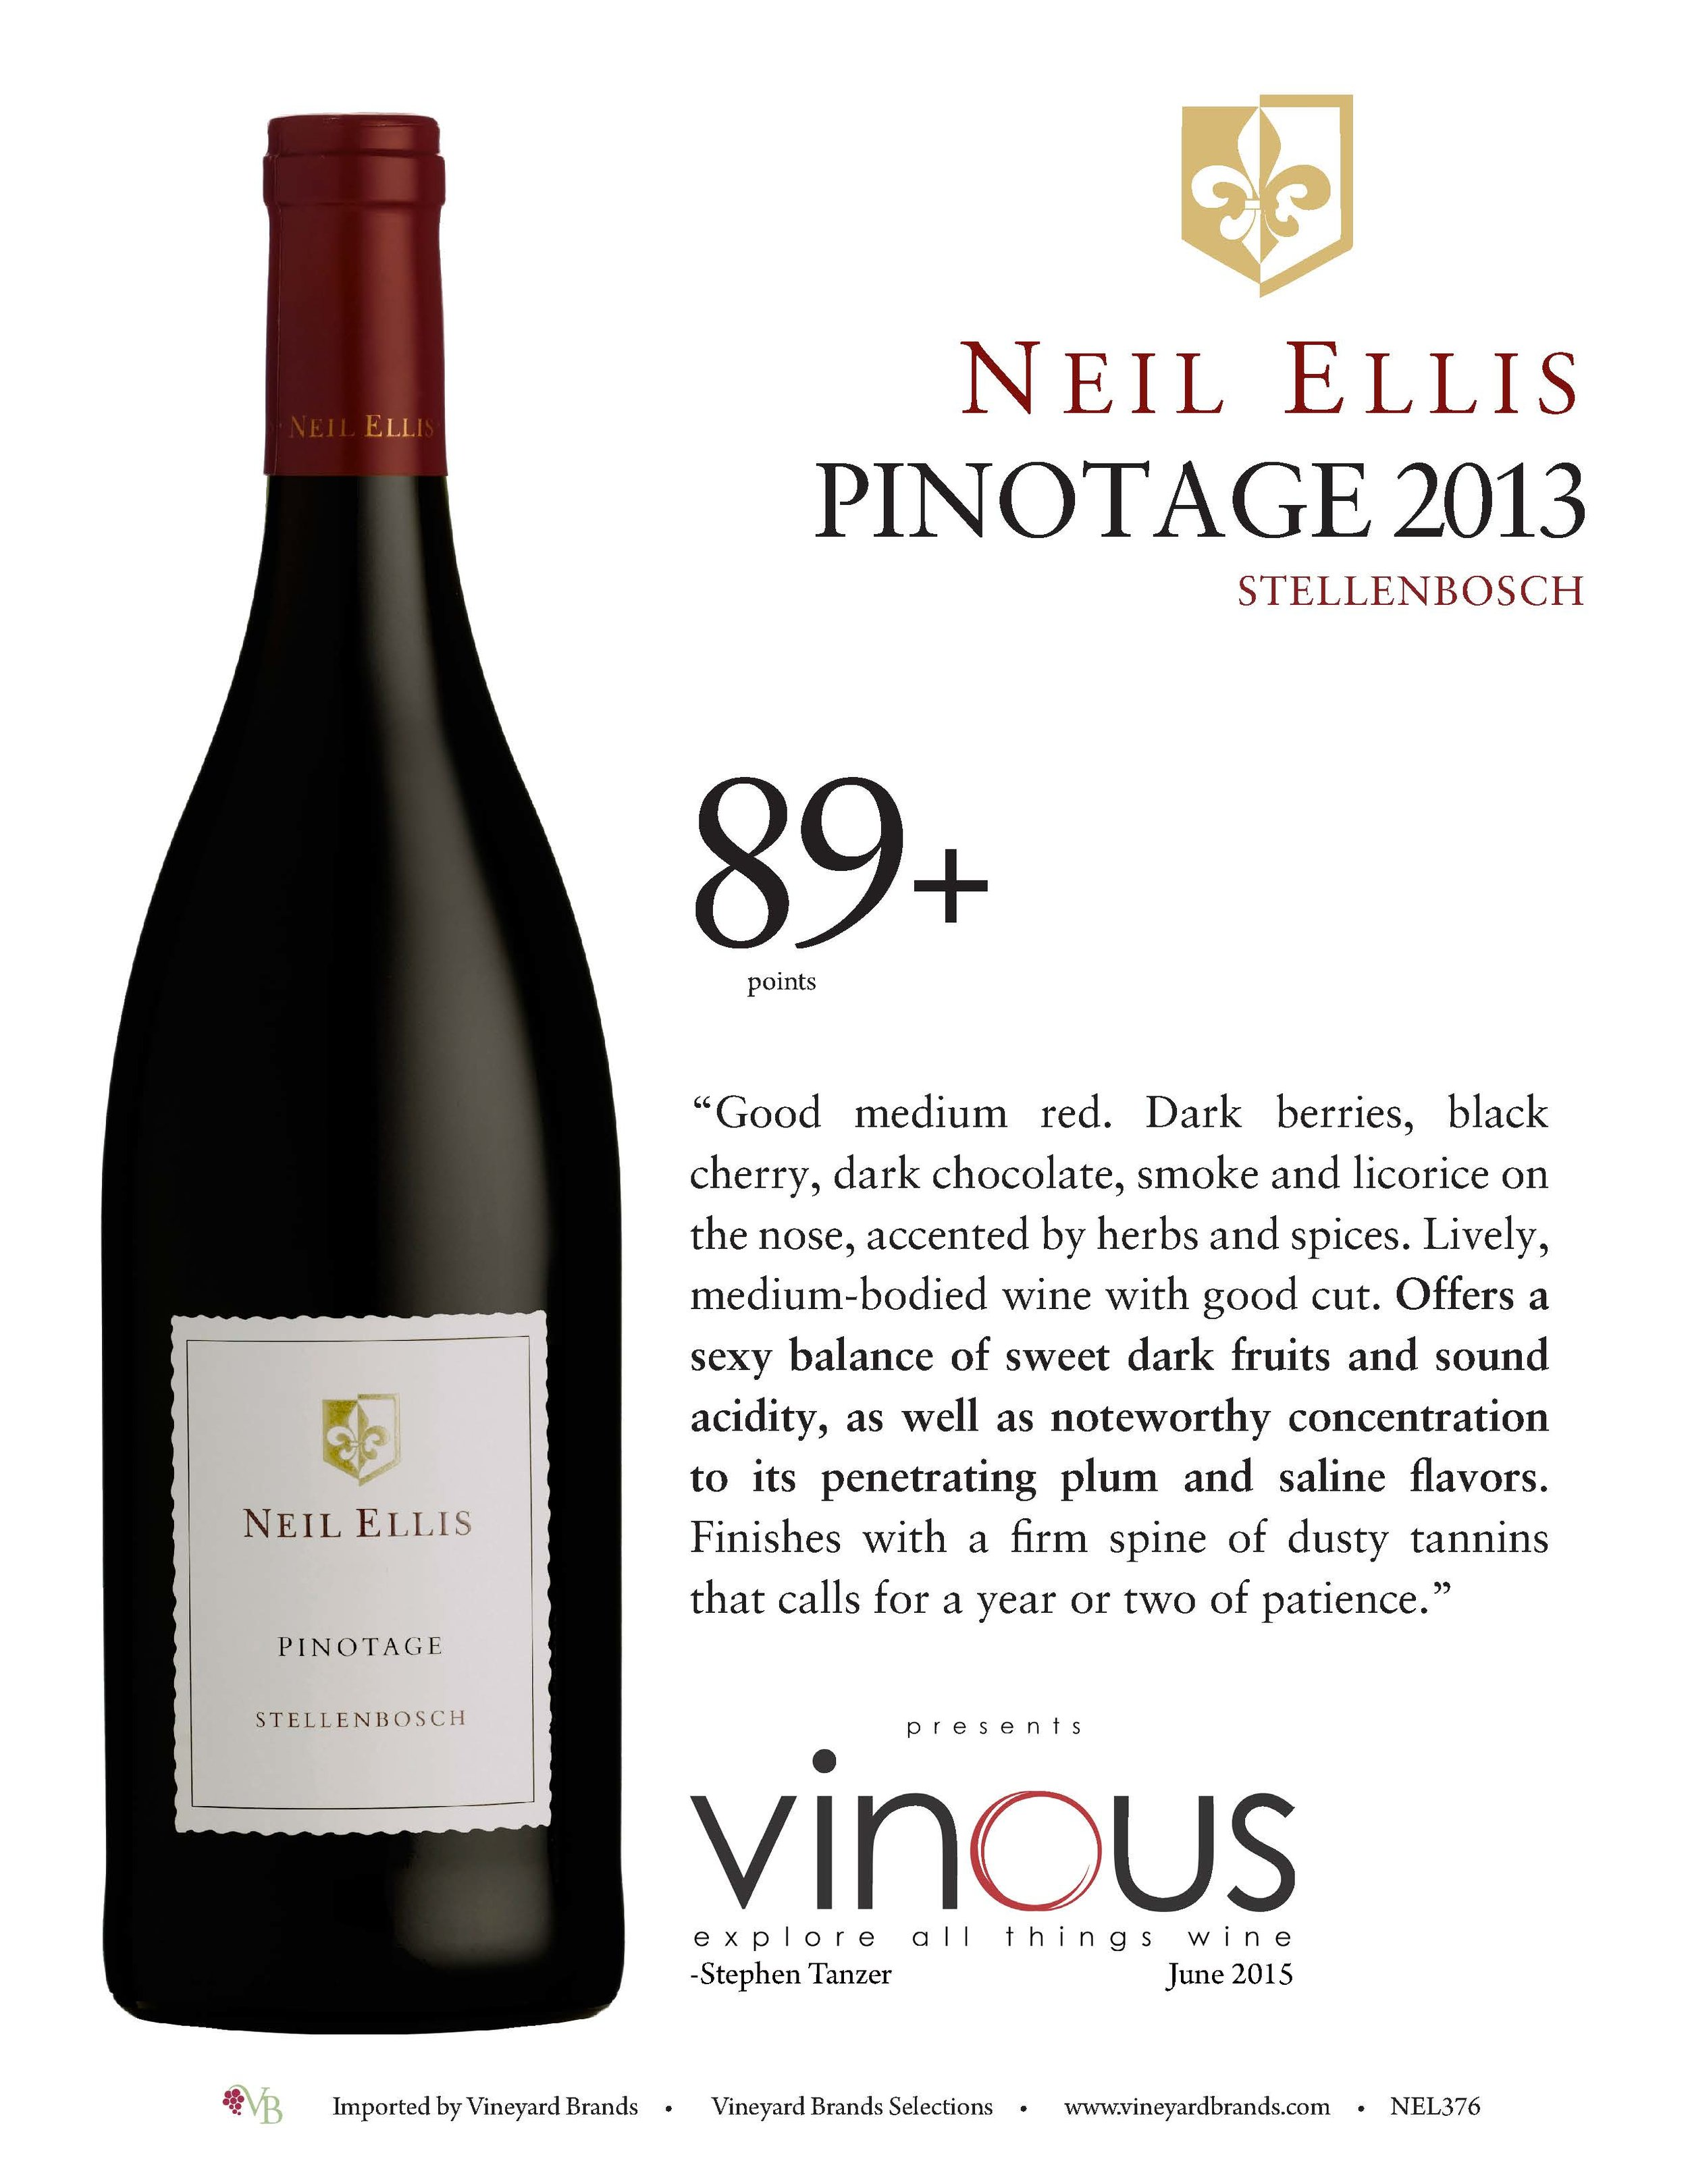 Neil Ellis Pinotage 2013